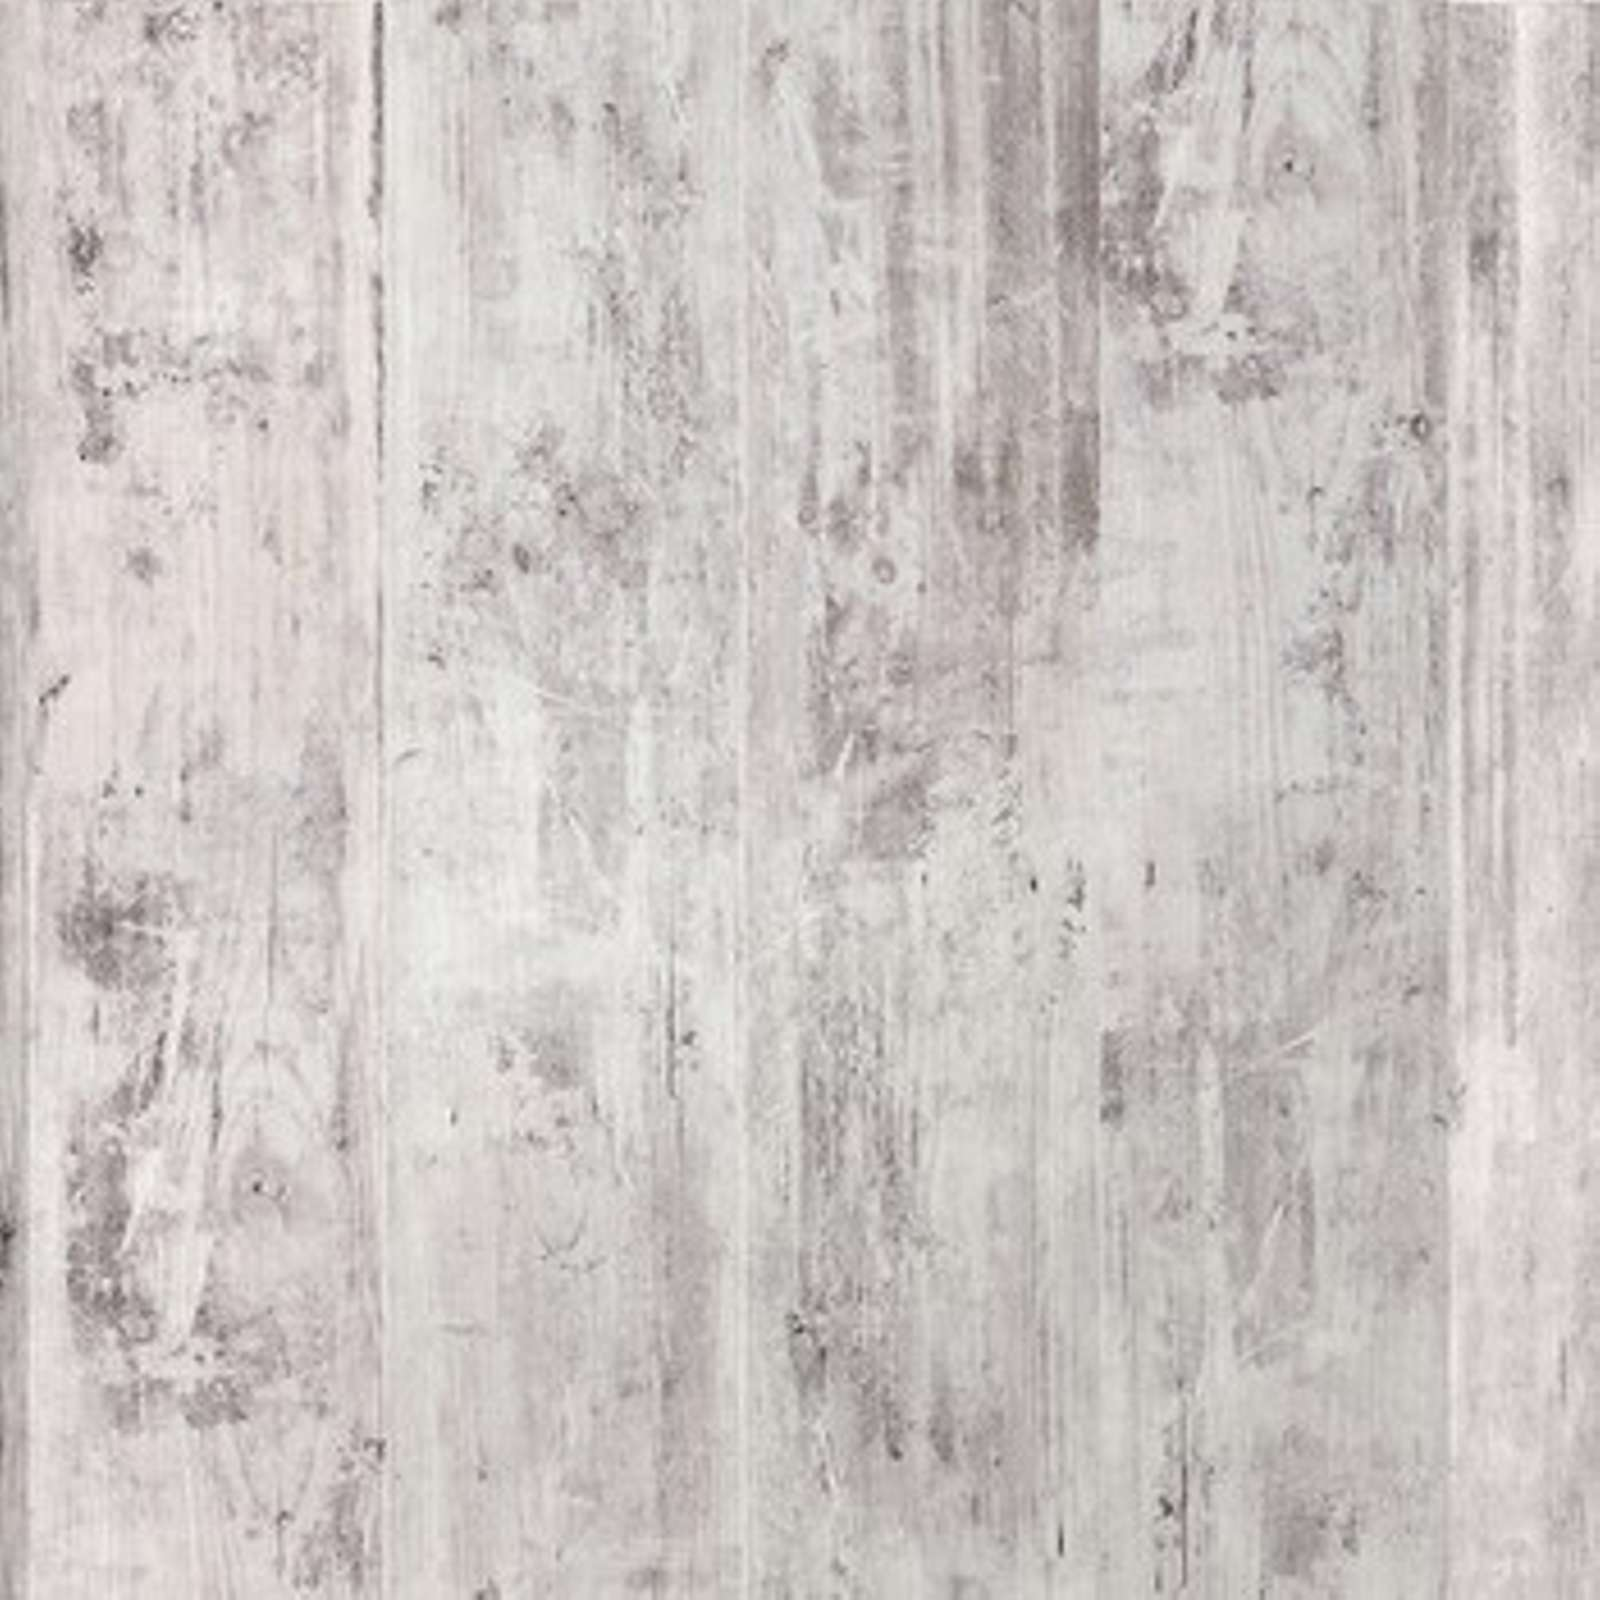 Плитка ПВХ Tarkett Art Vinil New Age Misty 101,6х914,4x2,1мм (2,41м2/26шт/уп) 277006012